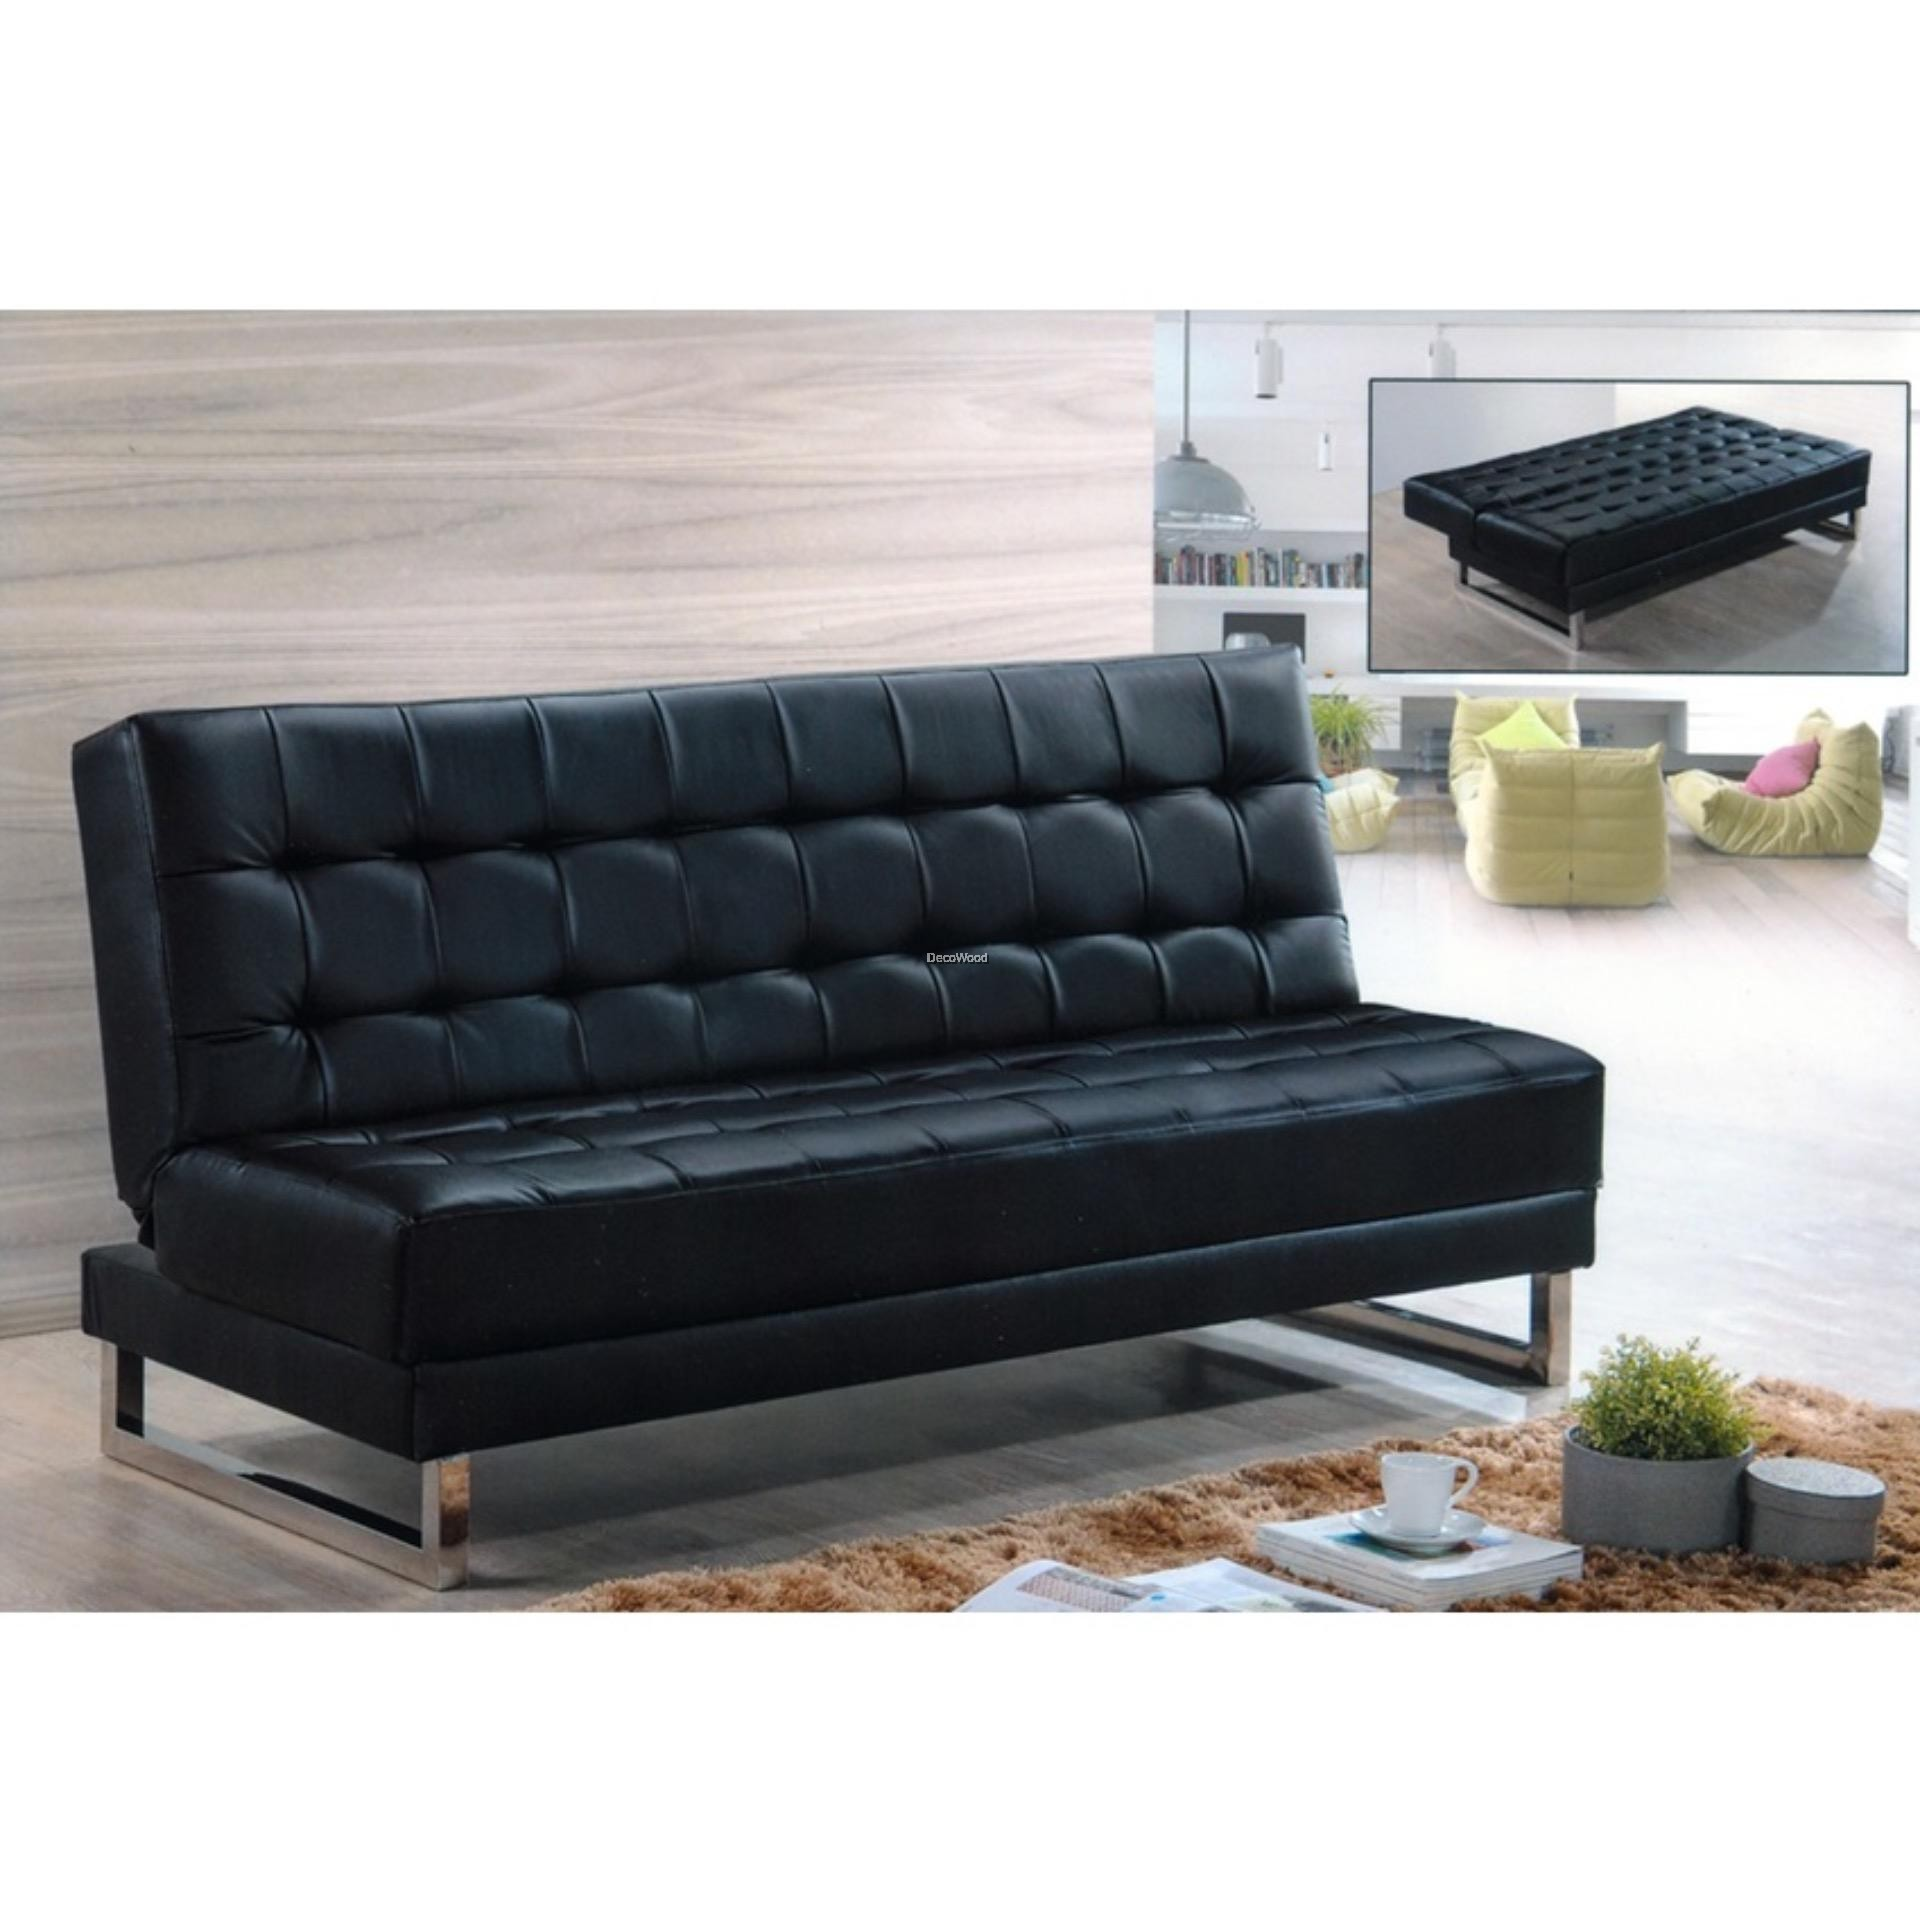 Fantastic Sabrina Good Leather Sofa Bed Black Andrewgaddart Wooden Chair Designs For Living Room Andrewgaddartcom